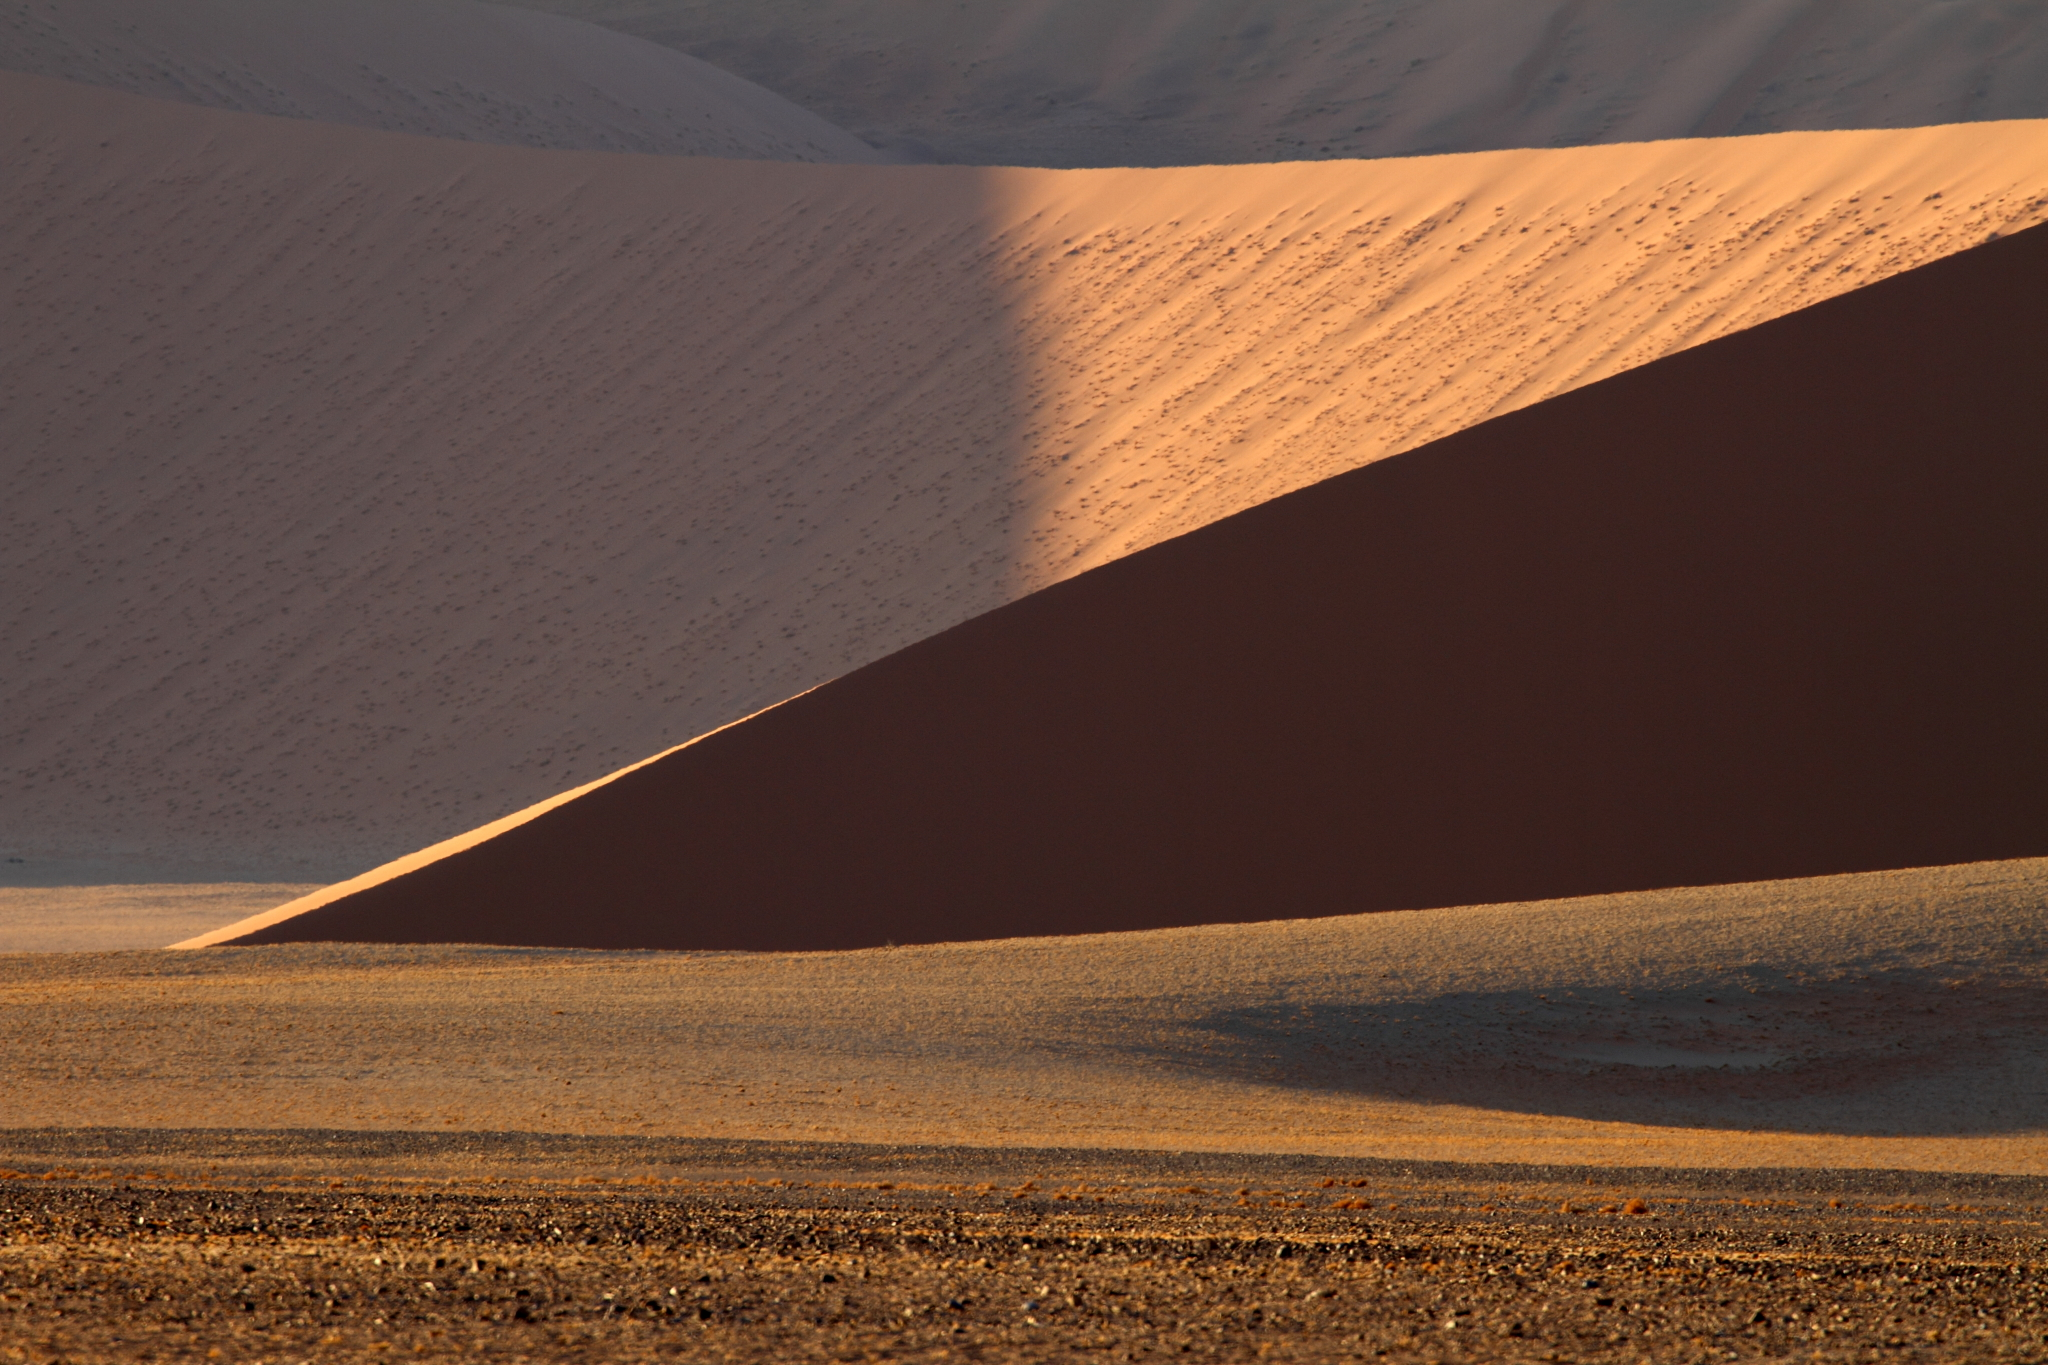 Sand Waves (Namibia, Sossuvlei)